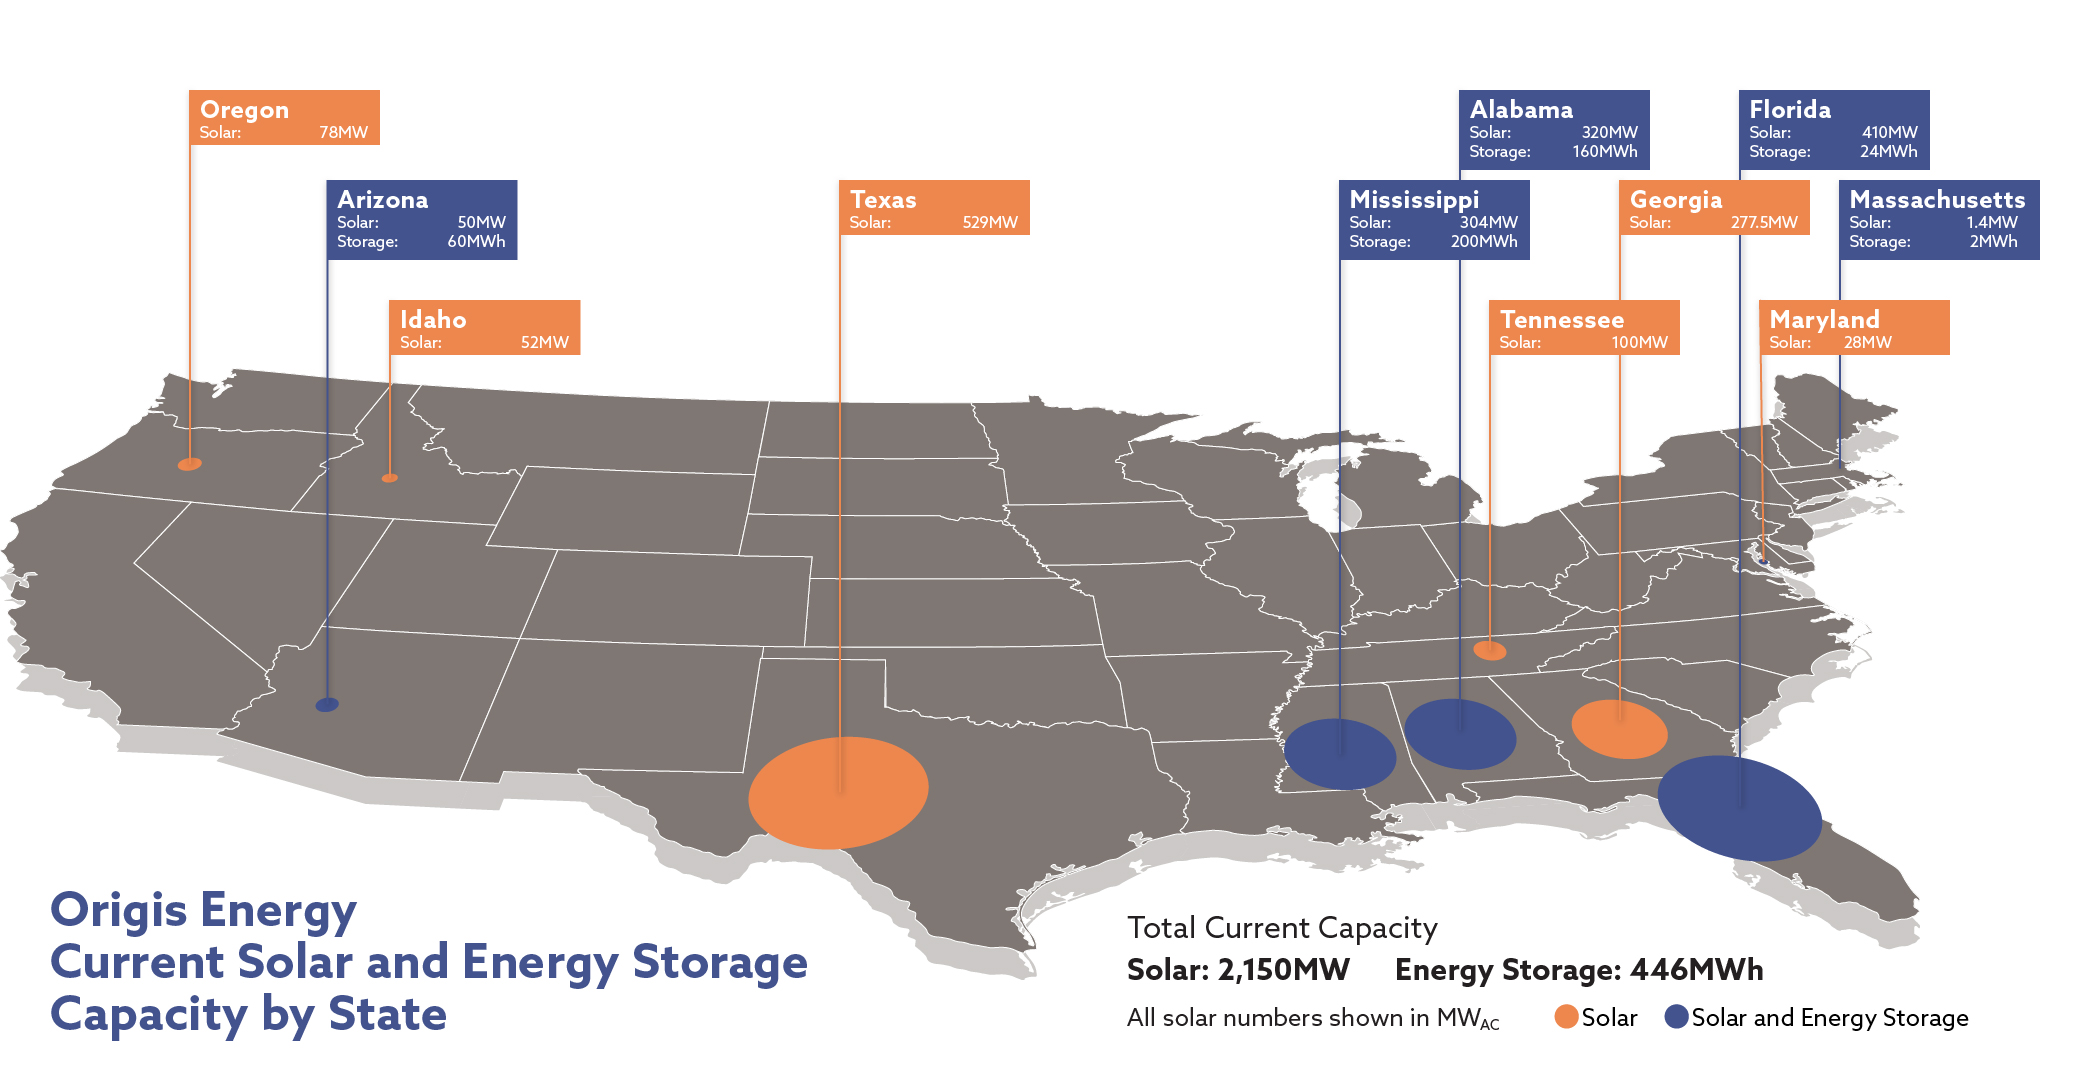 Origis Energy US capacity map